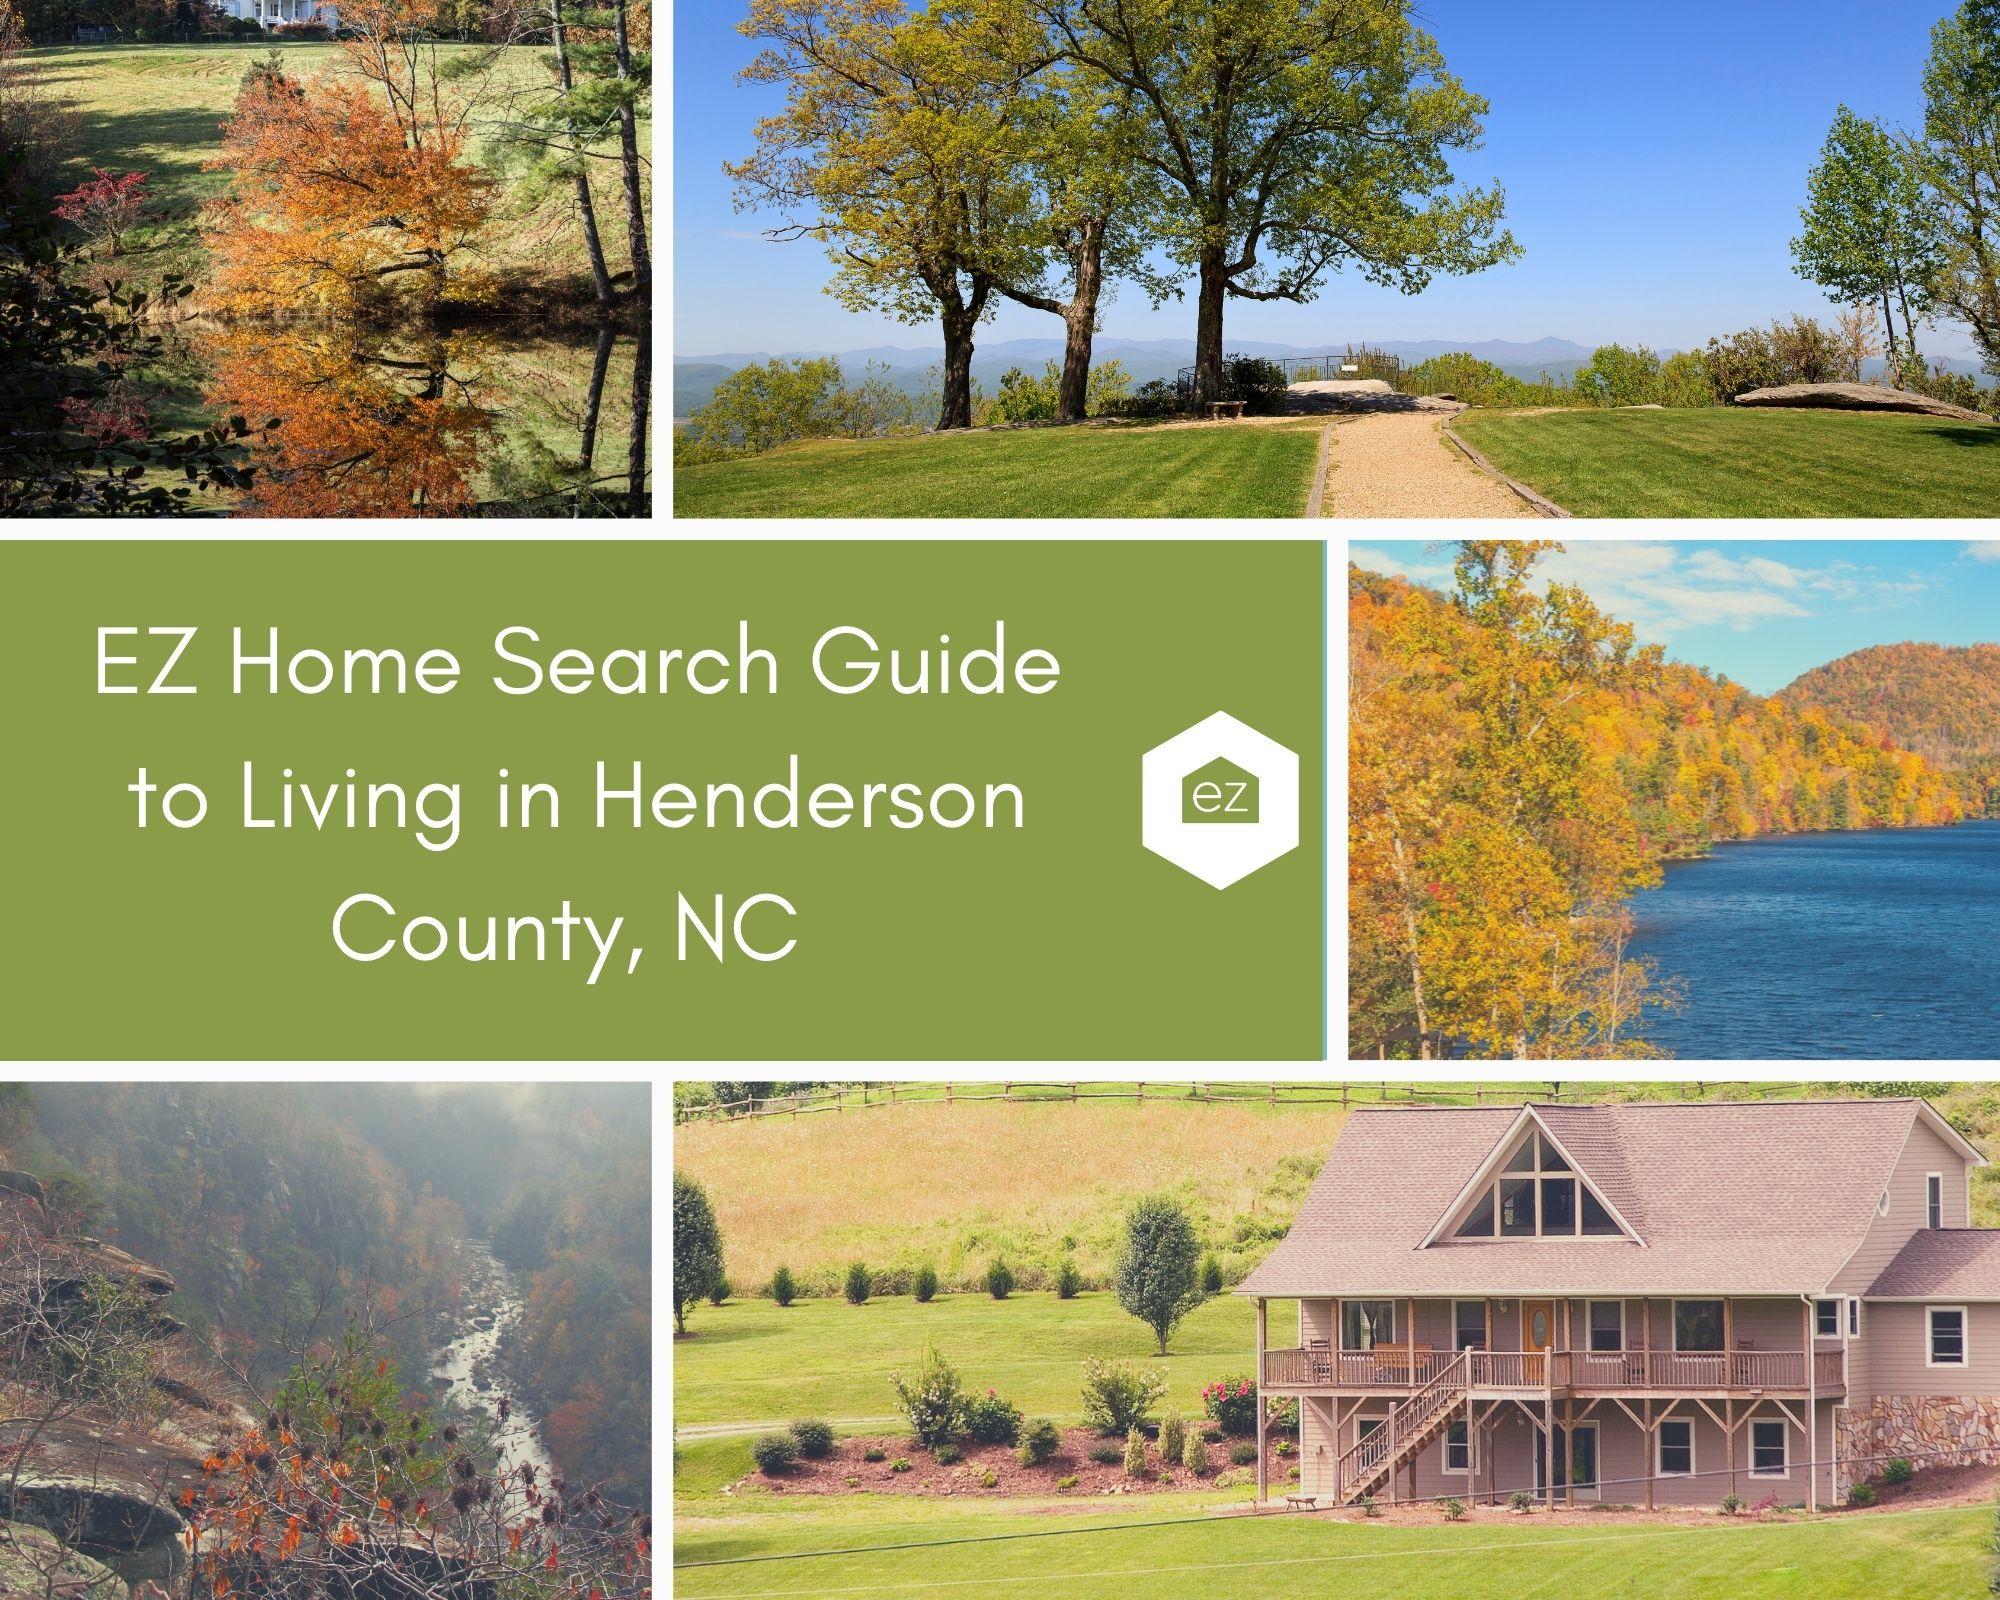 Photos of North Carolina and Henderson County, NC